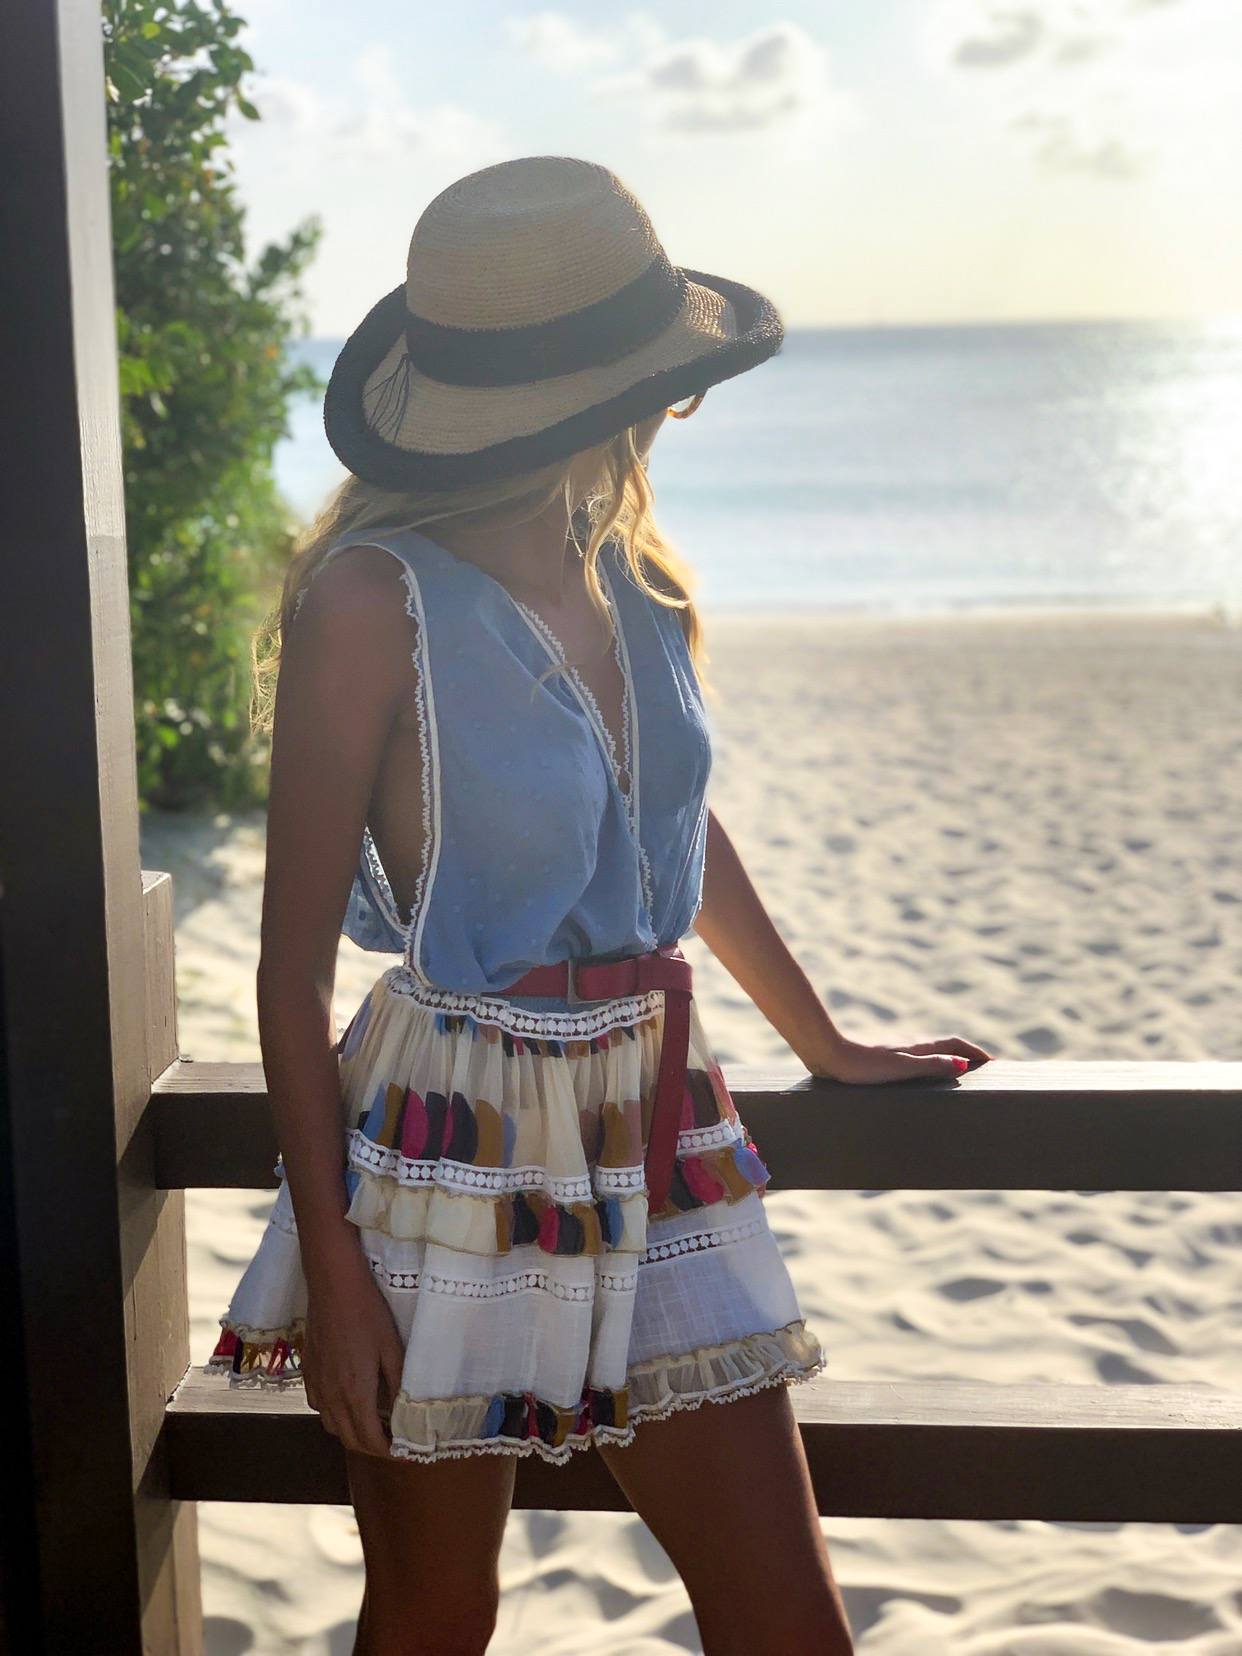 Chio Swimwear Dress (  similar here  )| Belt:  Brave Leather